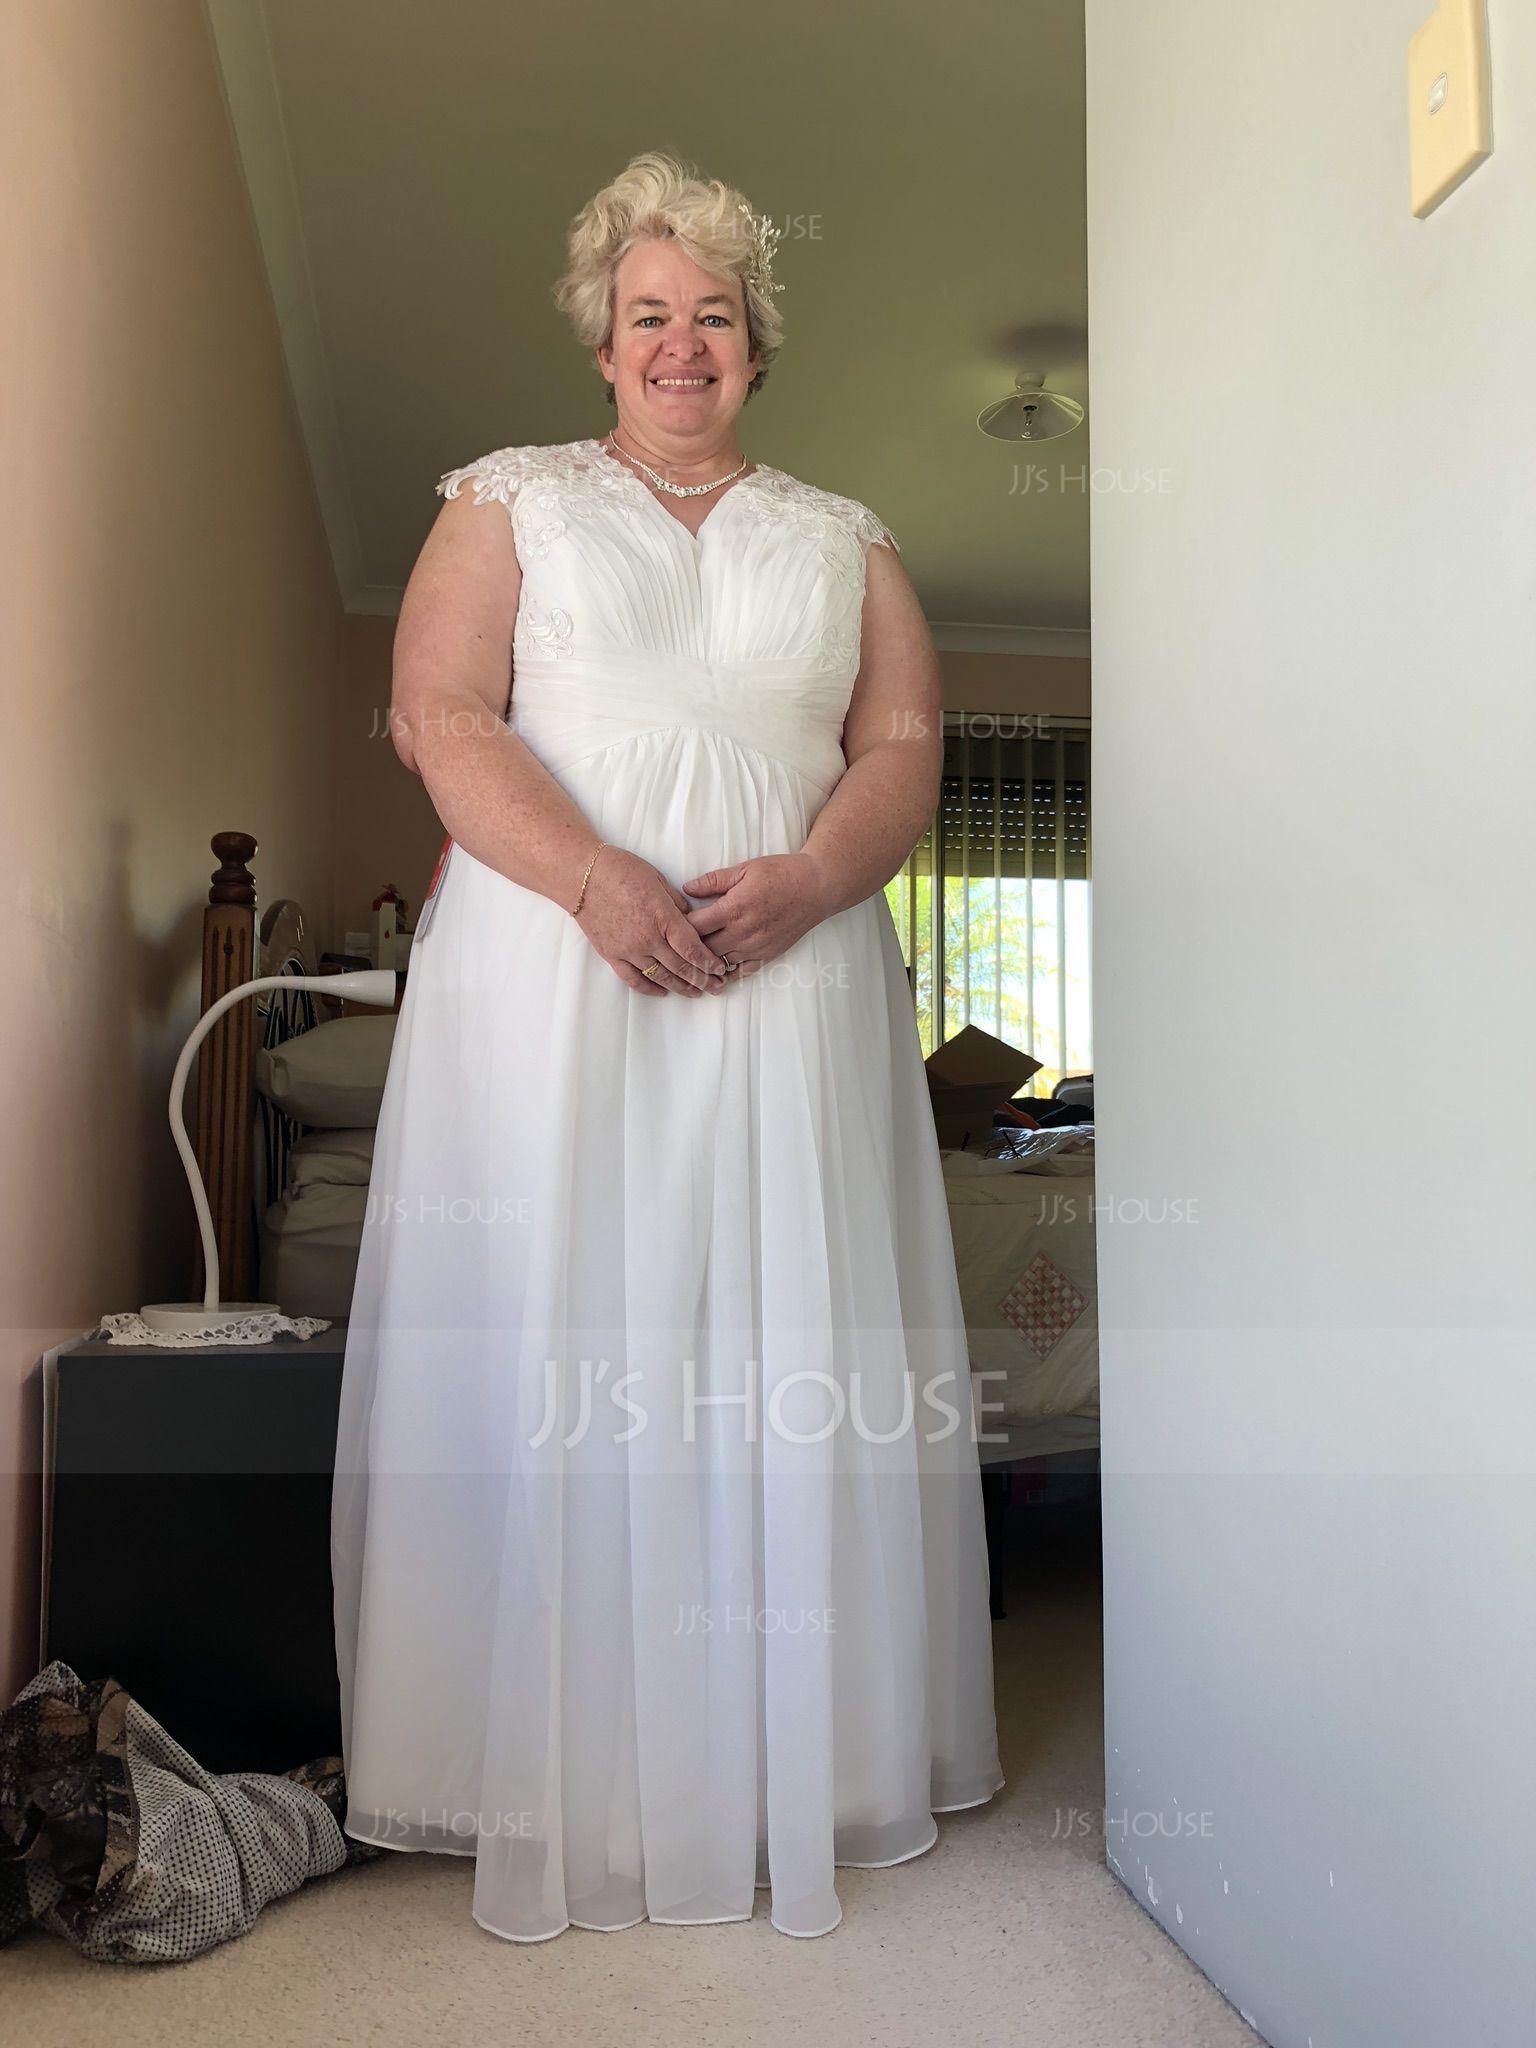 A-Line/Princess Sweetheart Floor-Length Chiffon Wedding Dress With Ruffle (002119798)